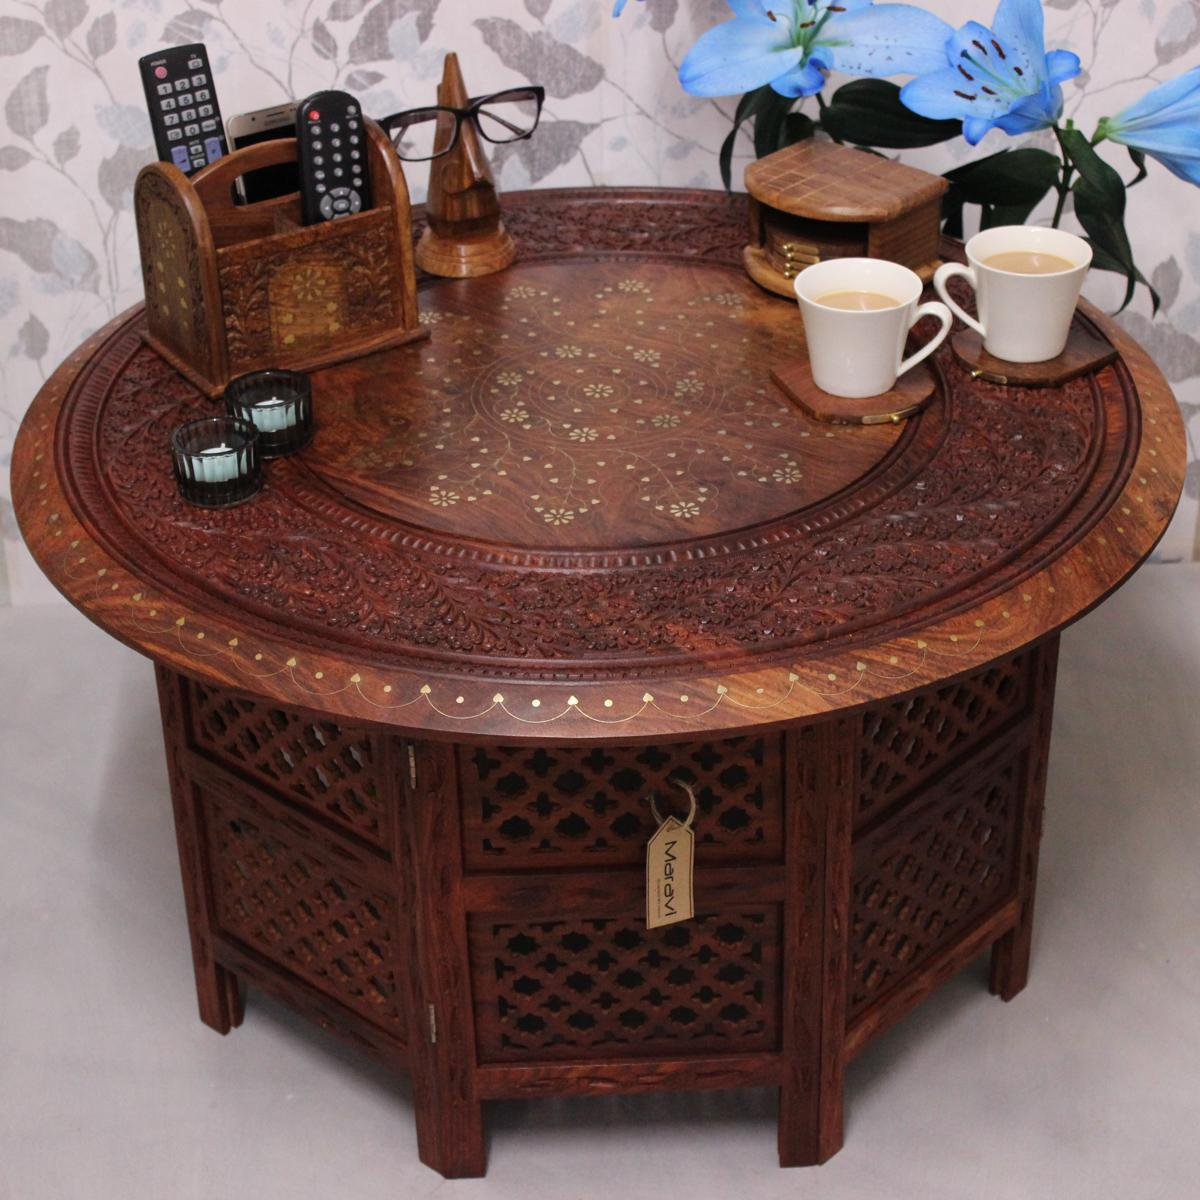 Large Round Coffee Table Uk: Karakoram Maravi Large Round Coffee Table Brown Solid